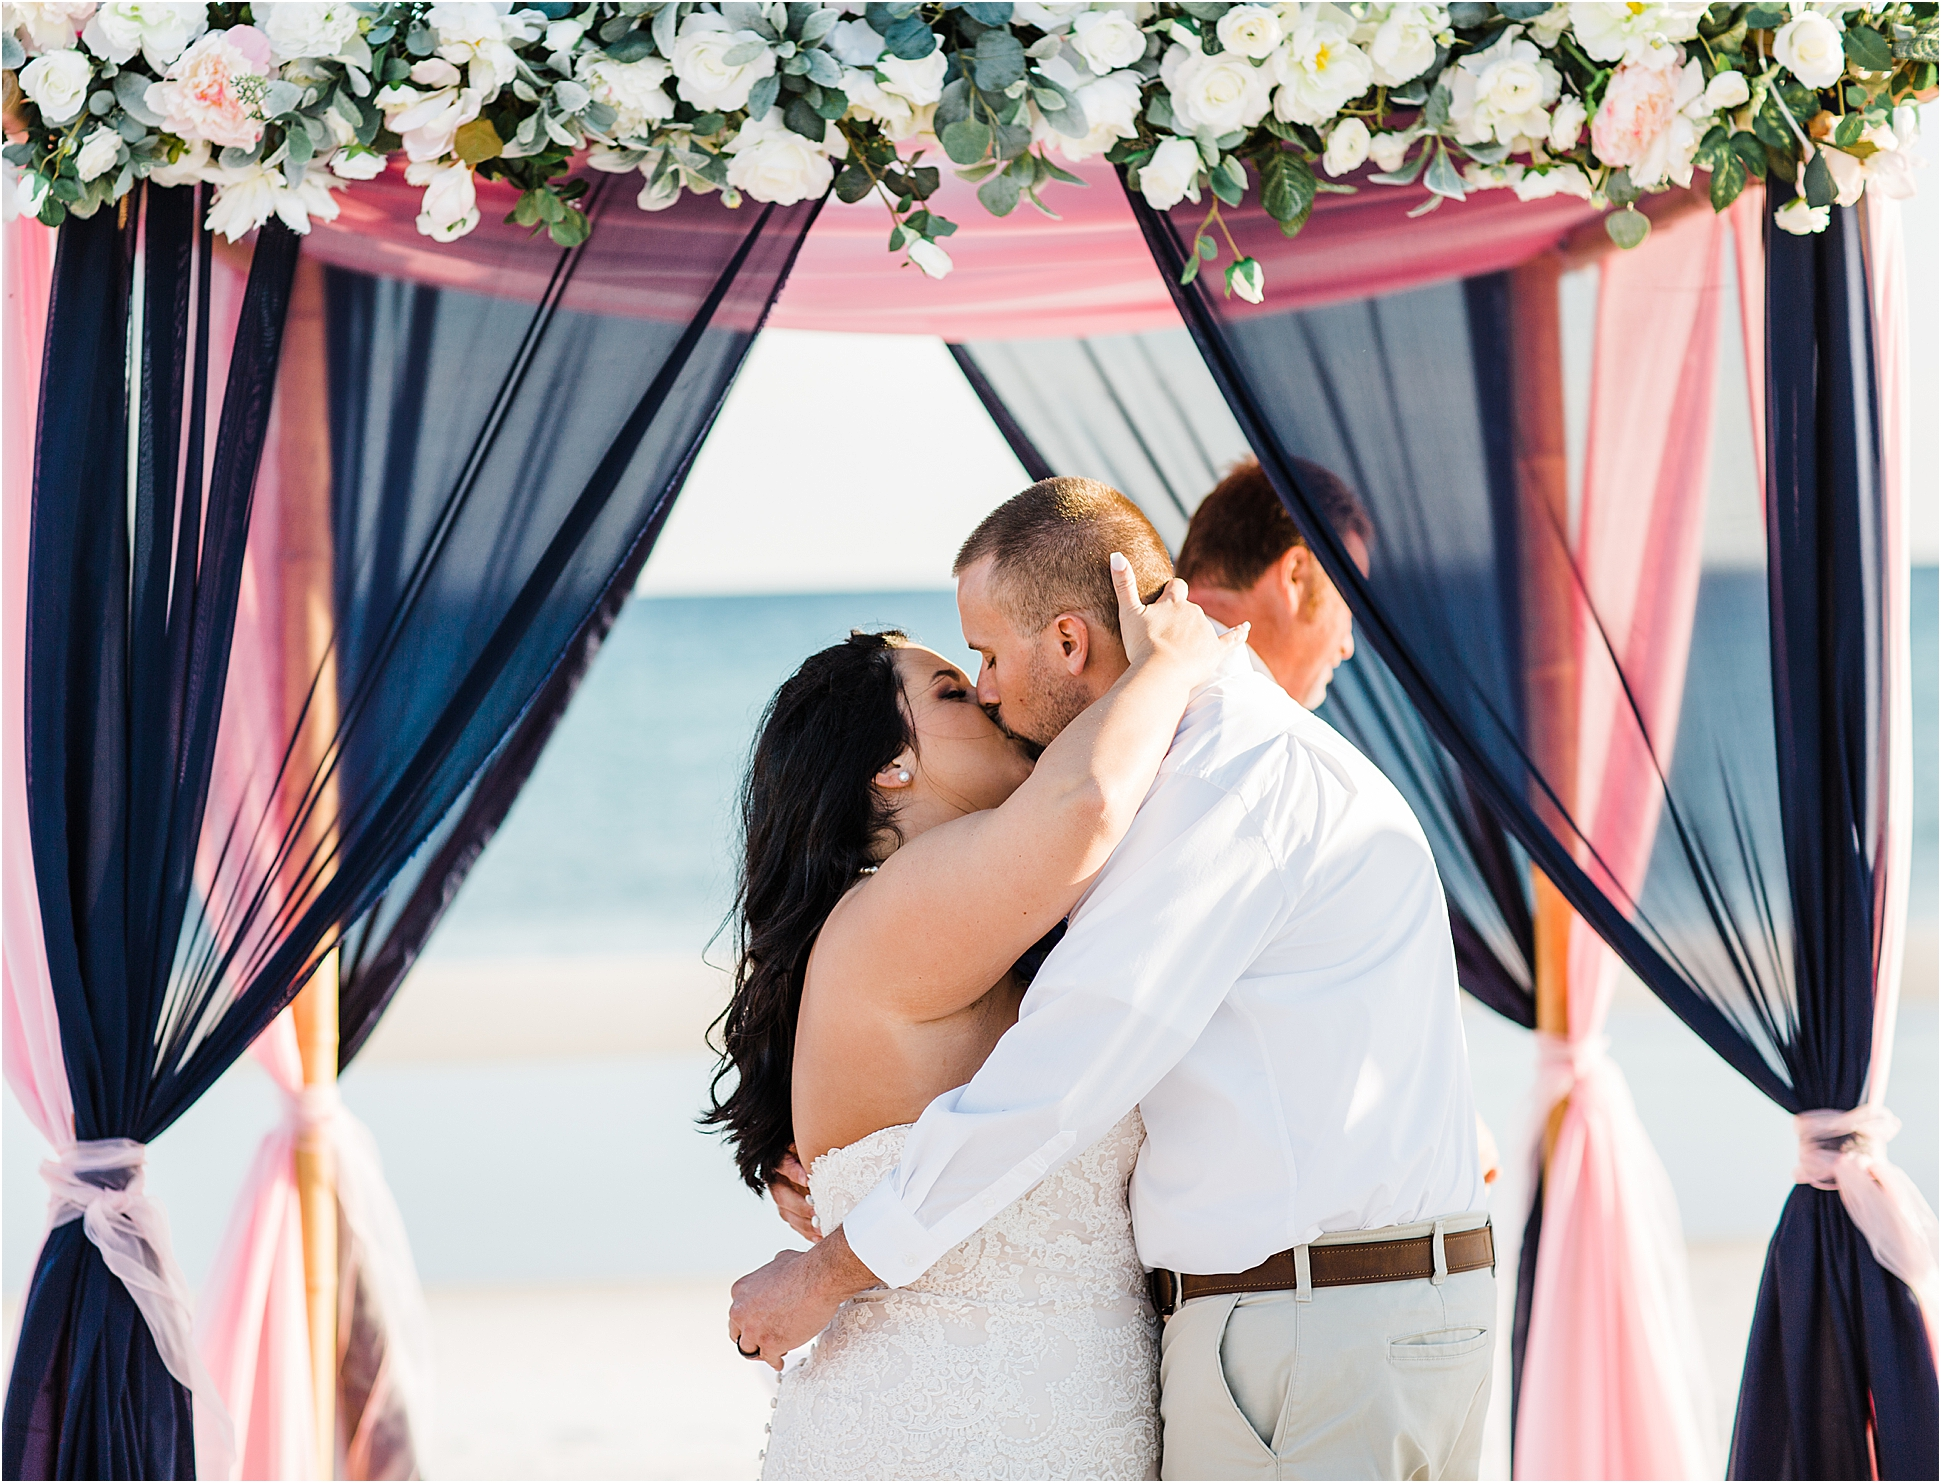 First kiss on the beach